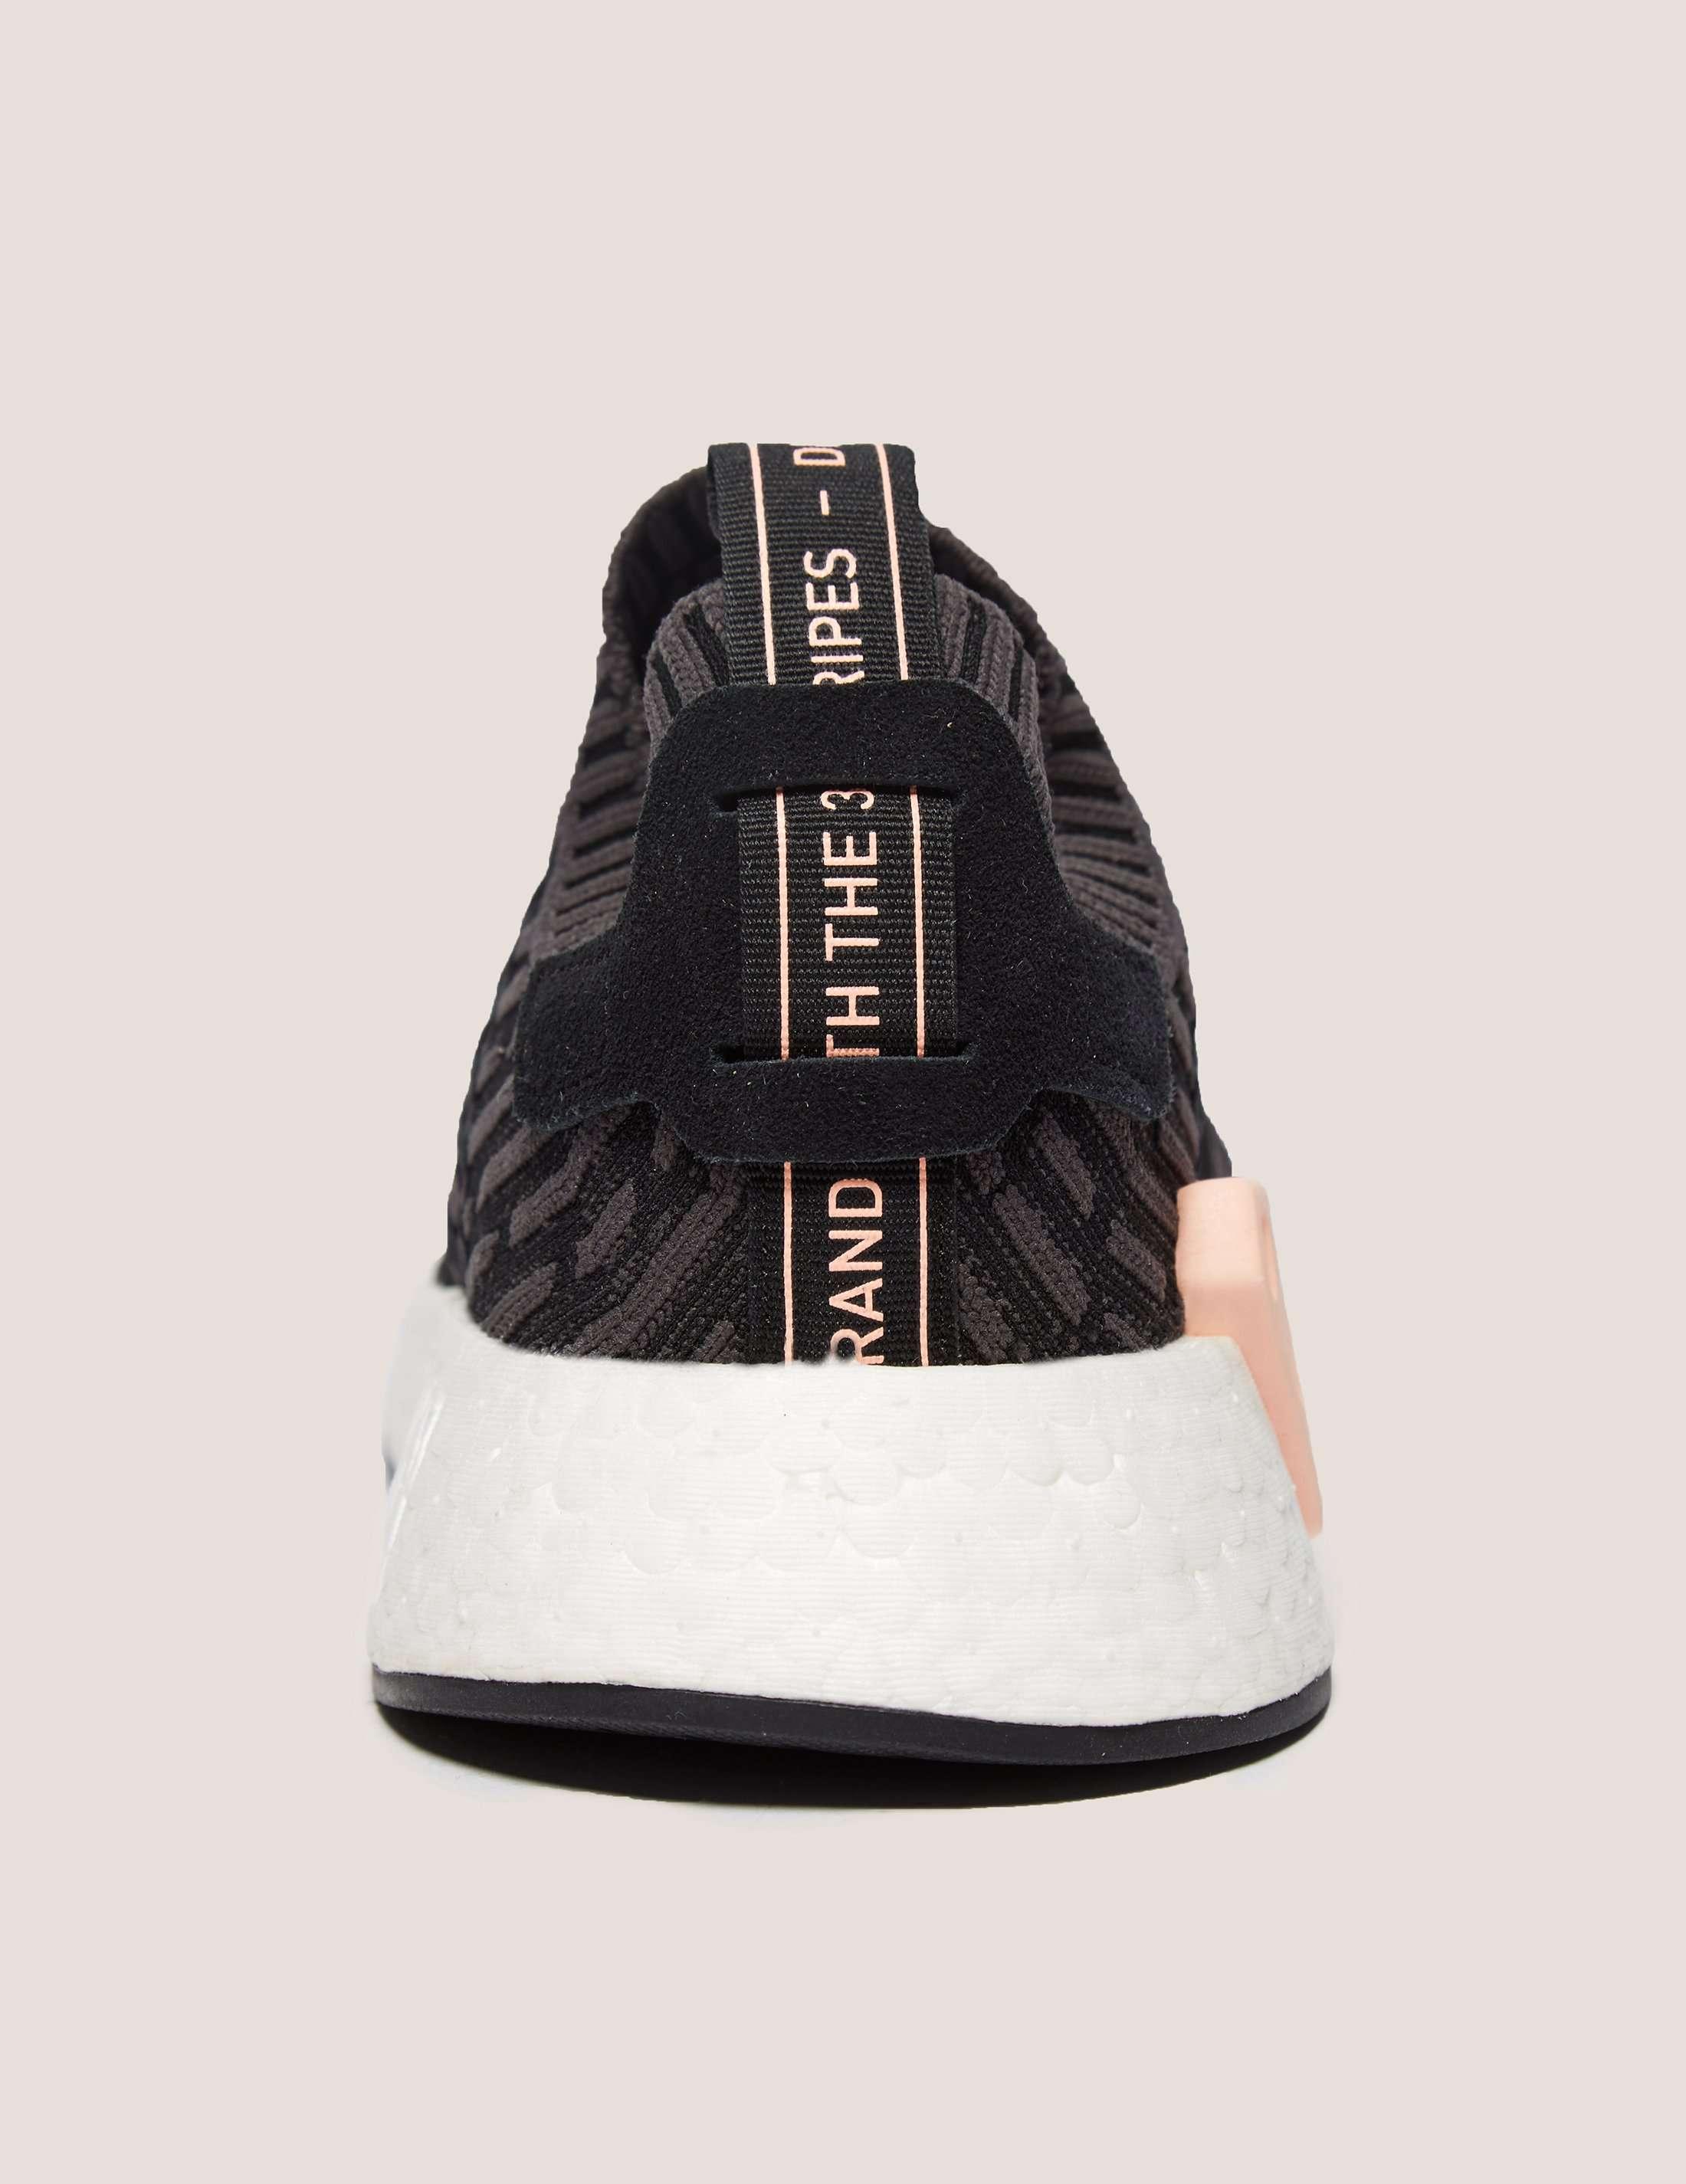 adidas Originals NMD_R2 Women's